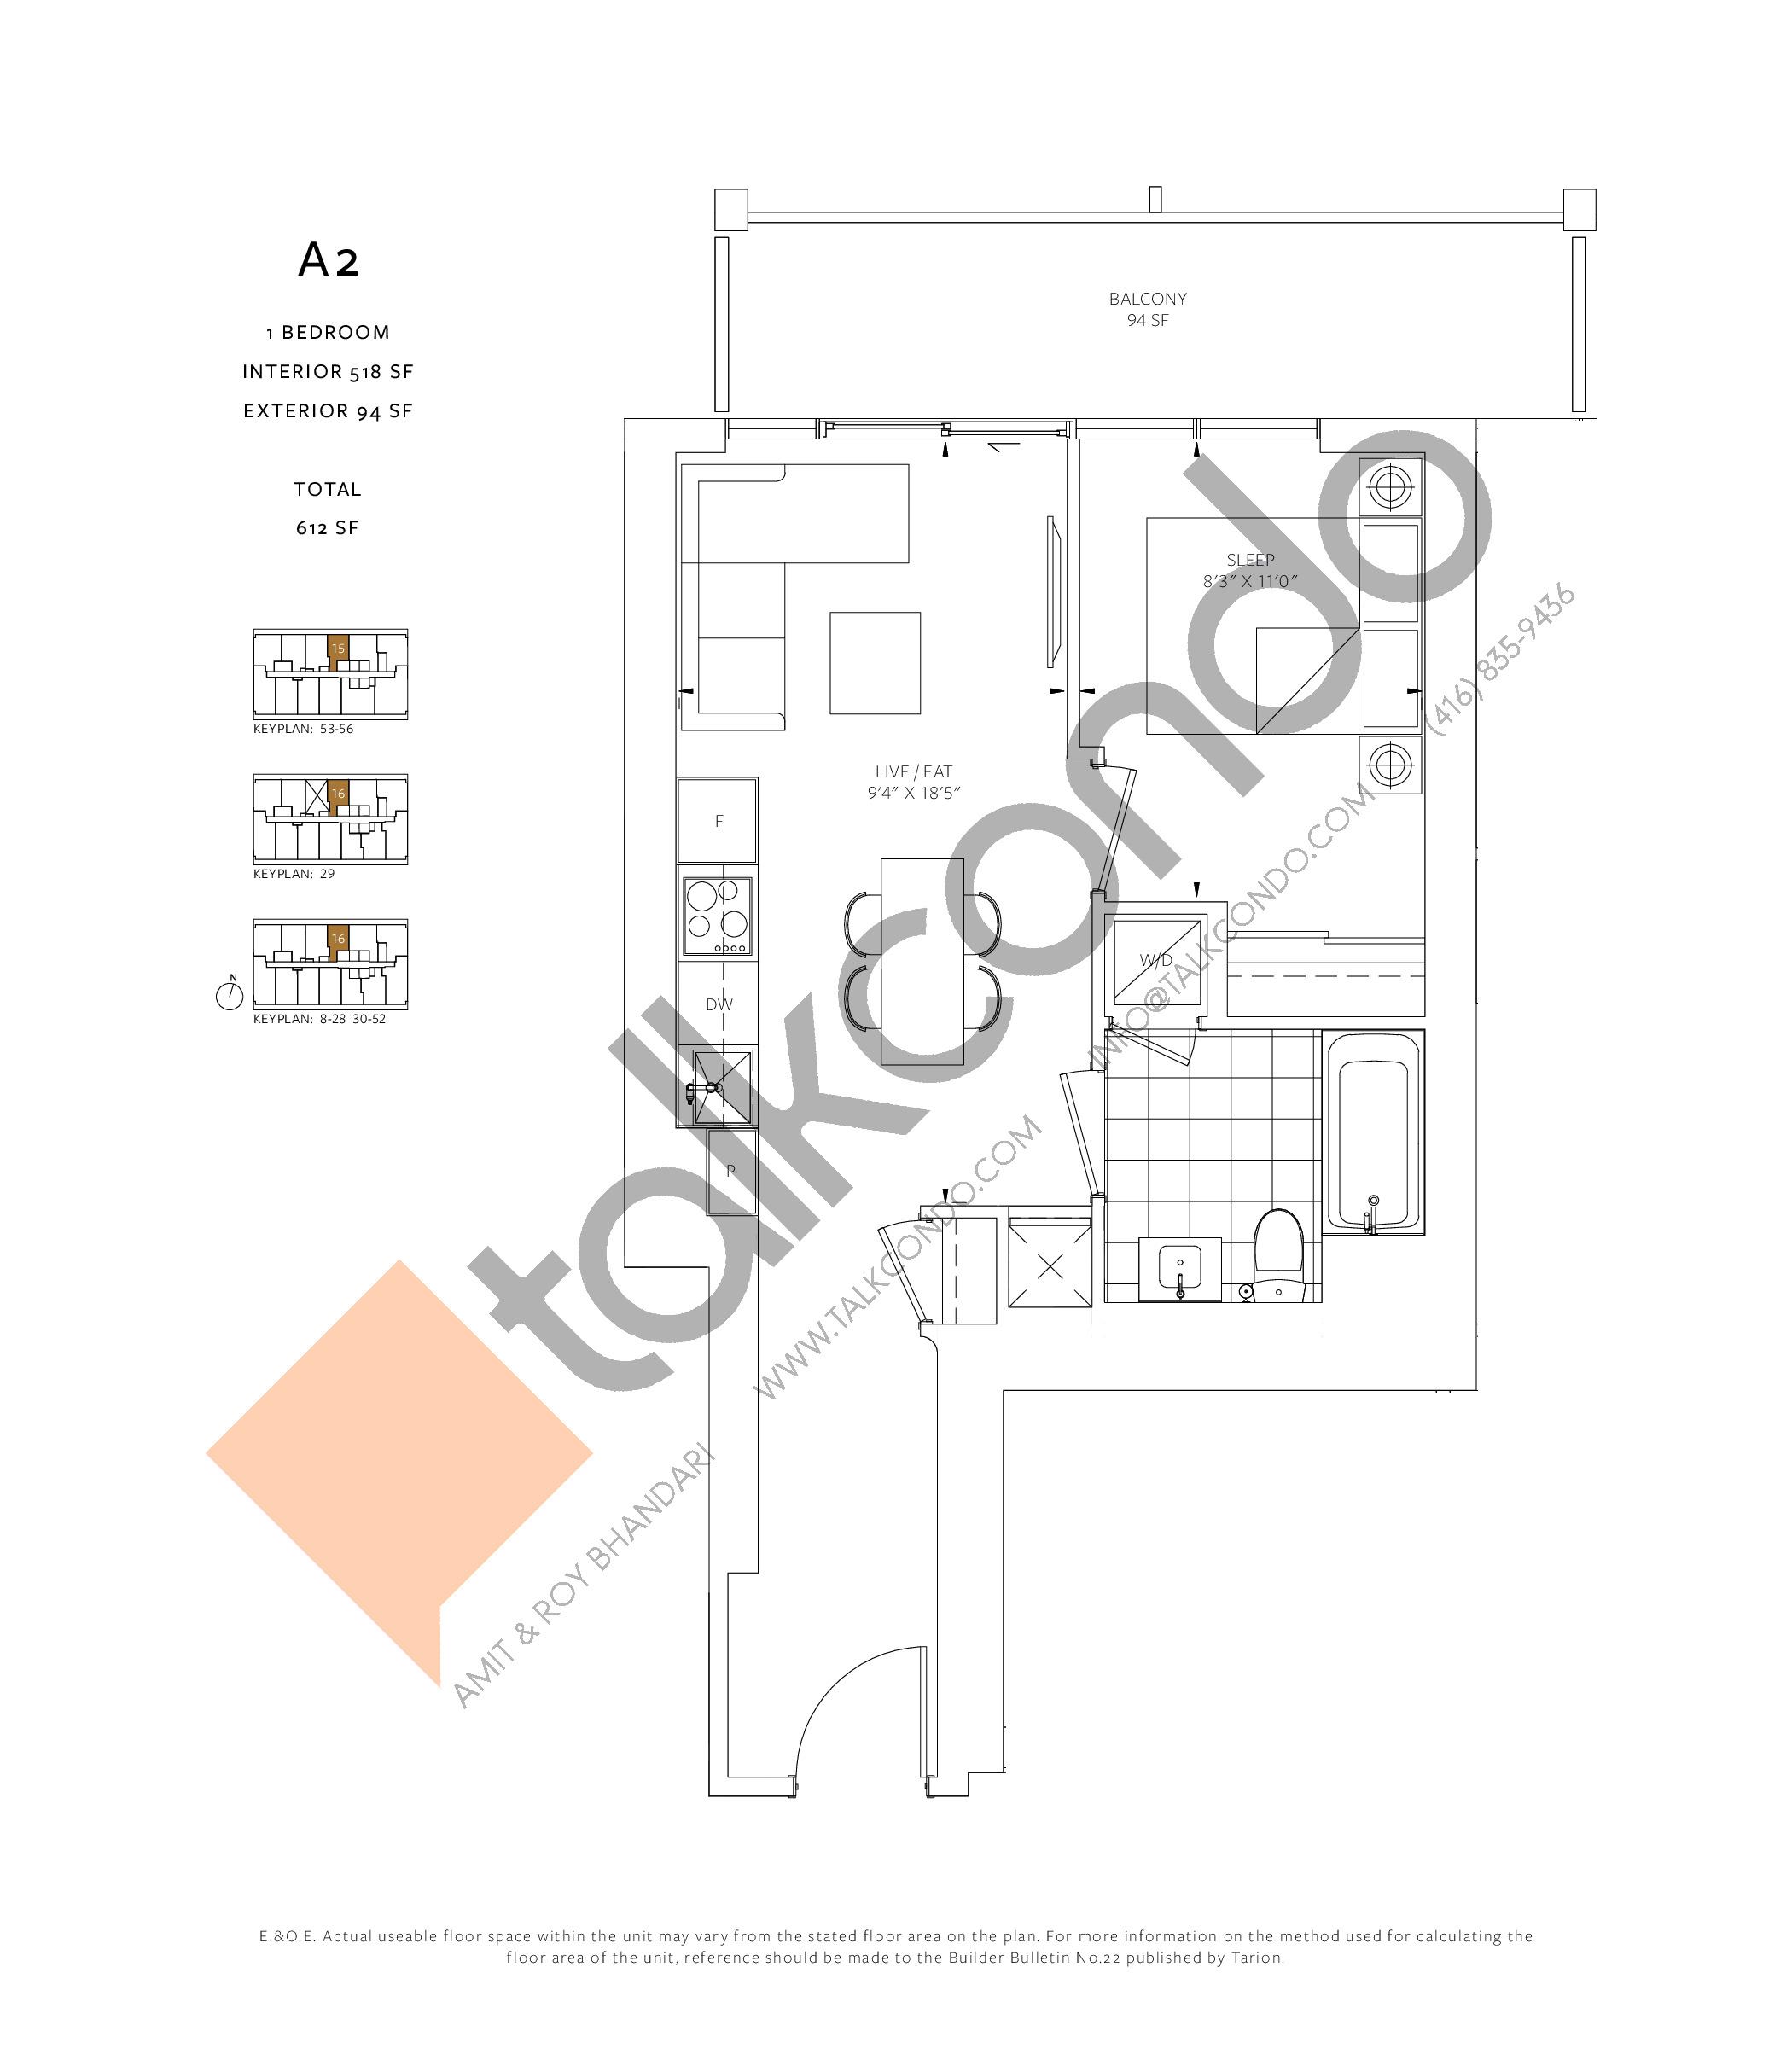 A2 Floor Plan at 88 Queen Condos - 518 sq.ft